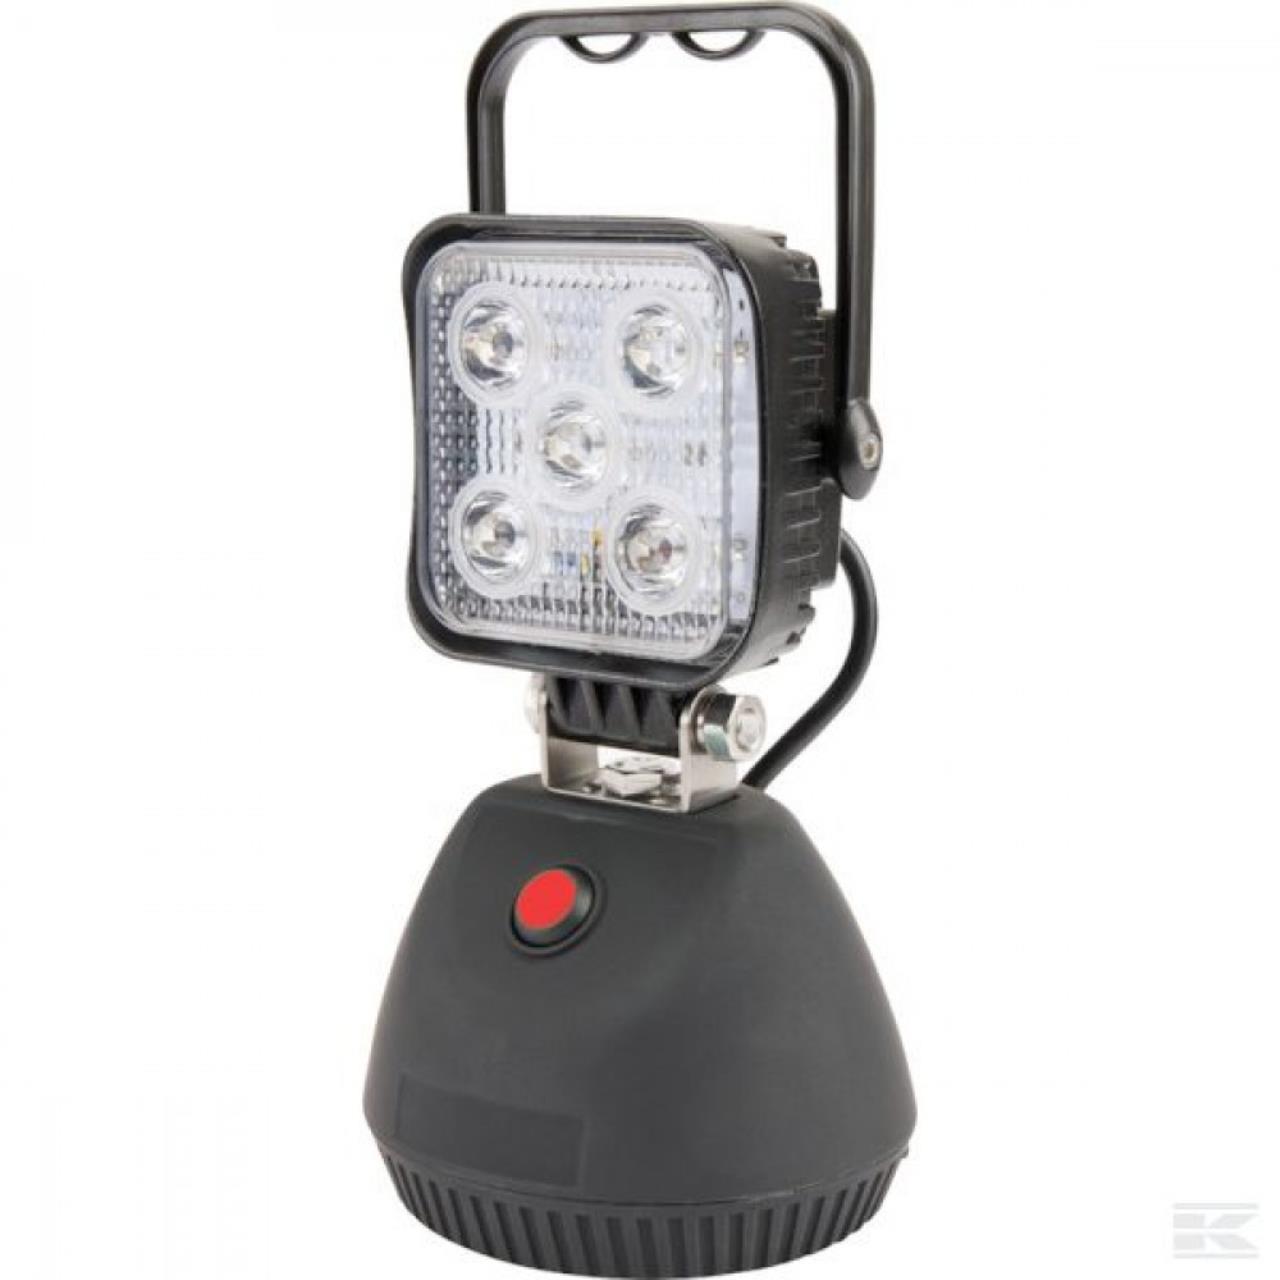 LED mobil akku-arbejdslampe m/magnetfod